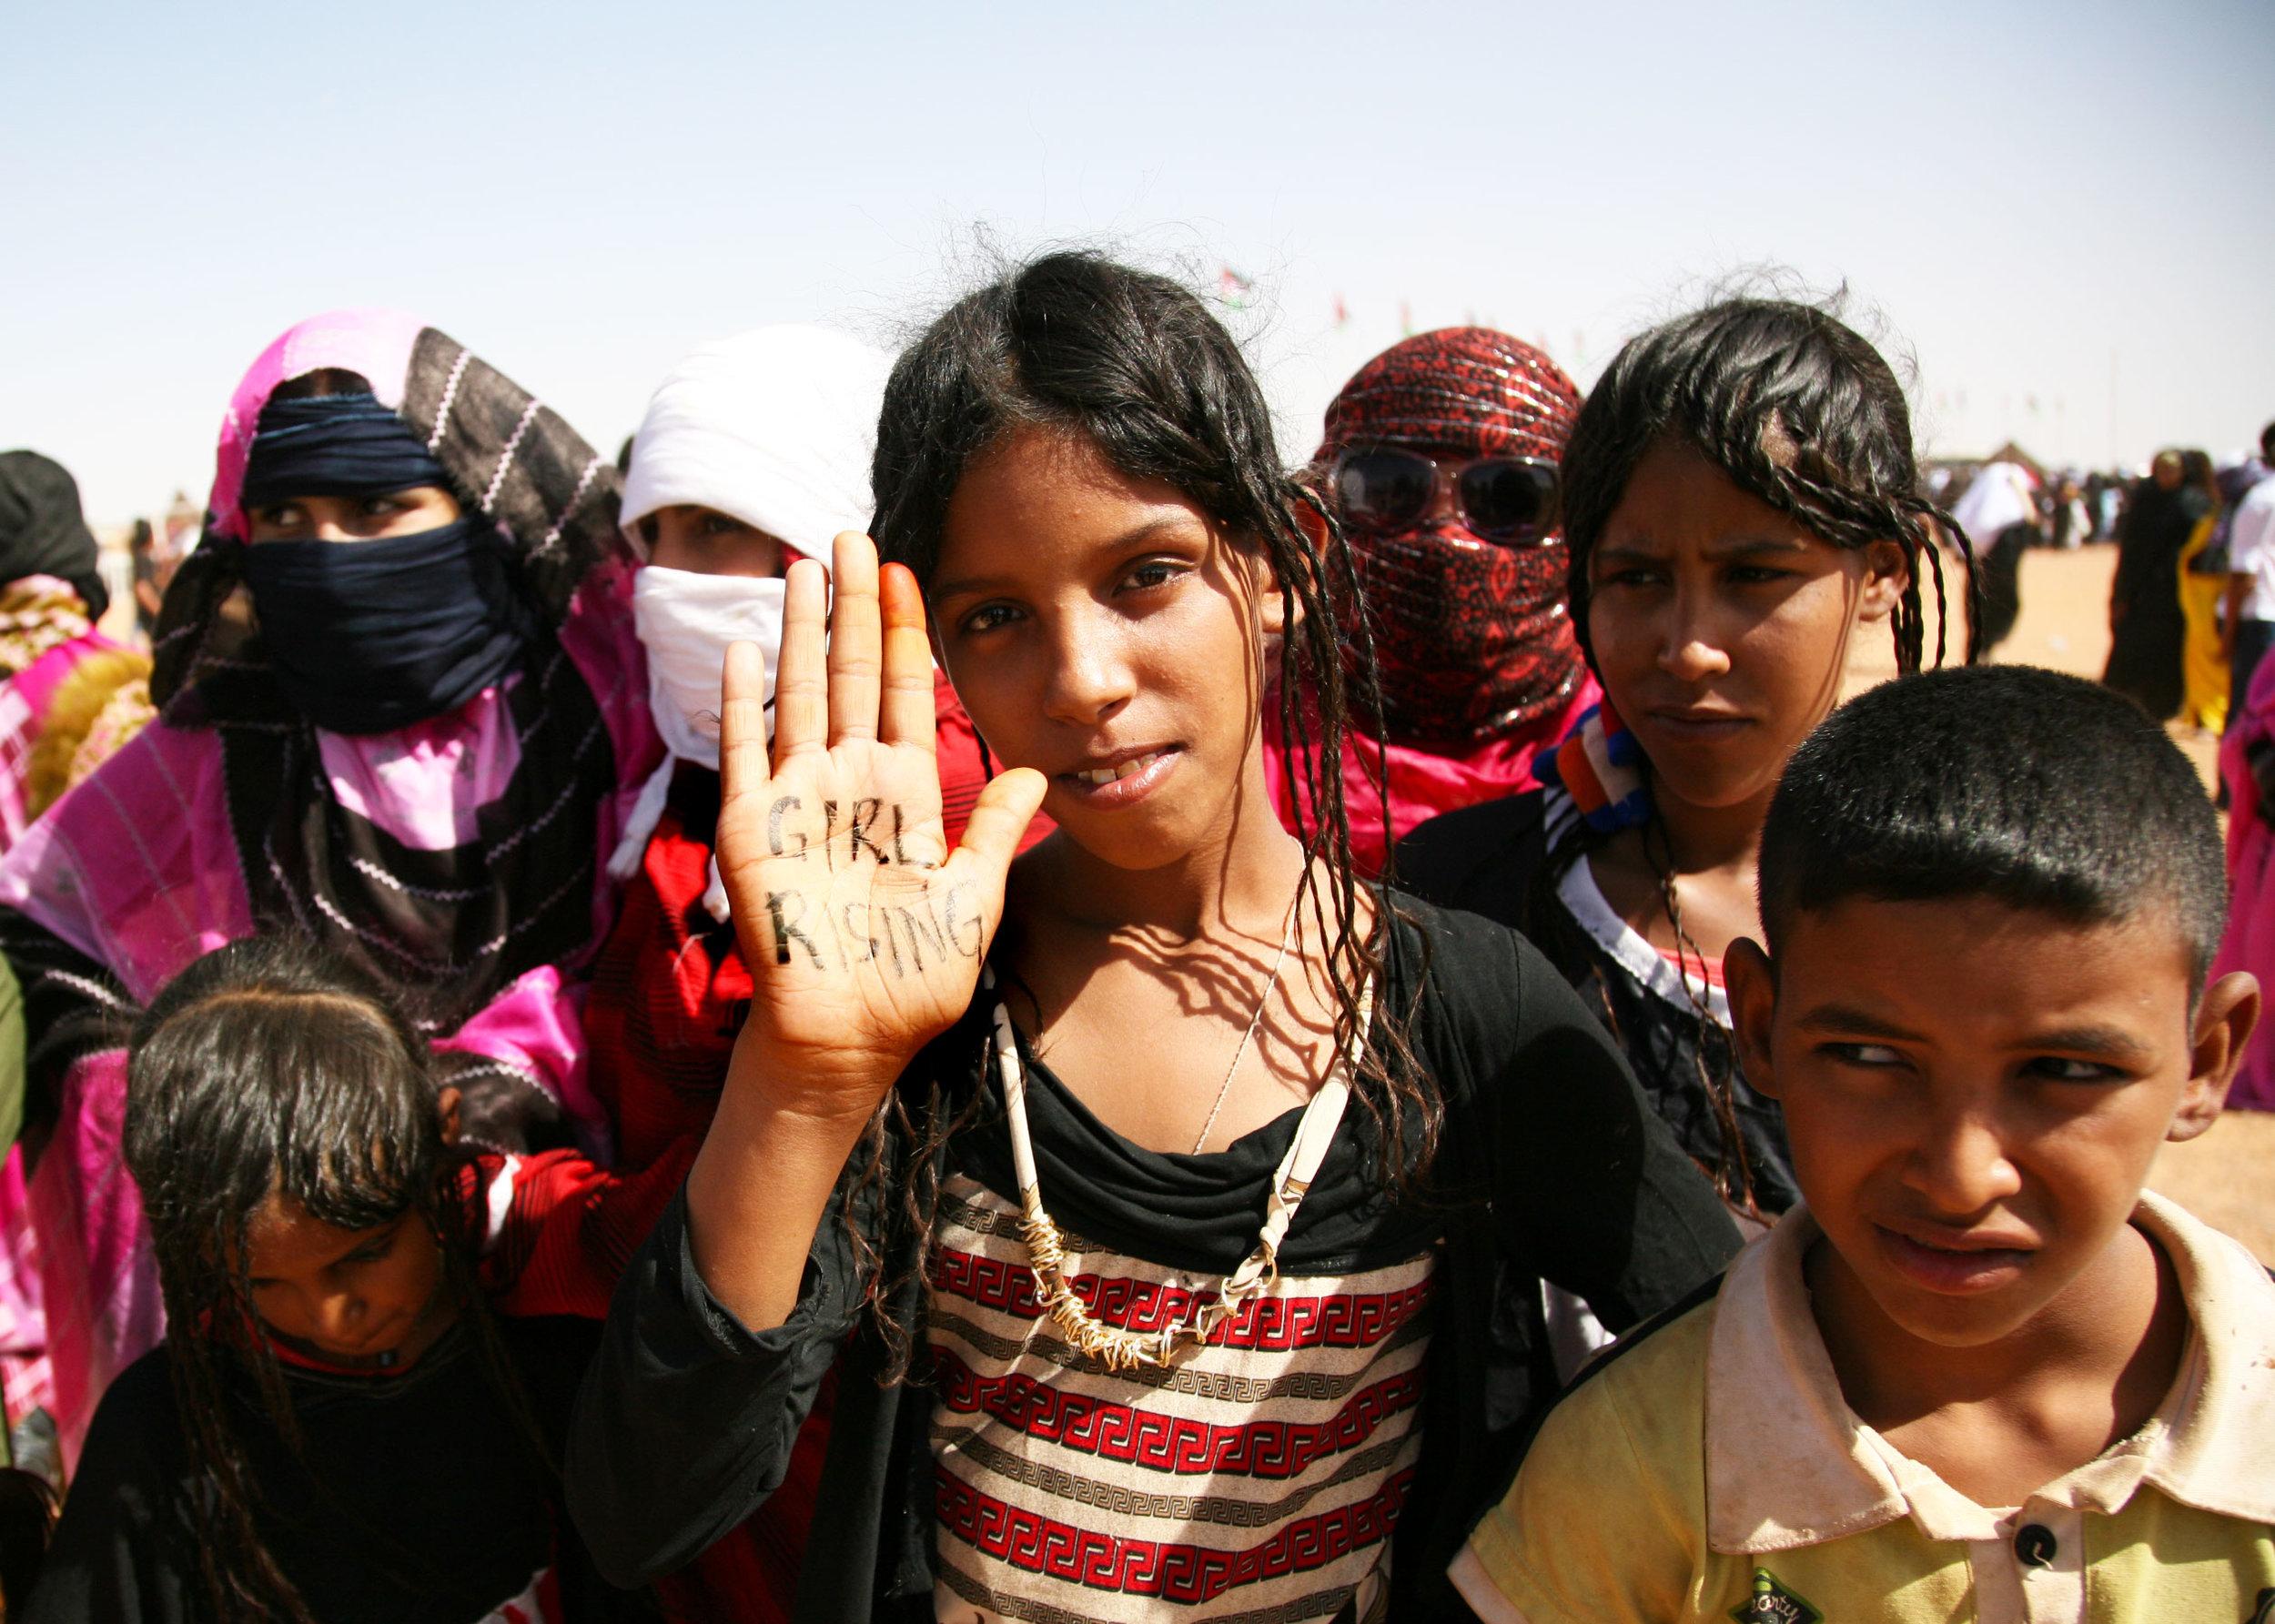 Girl Rising tells stories to ignite change. -